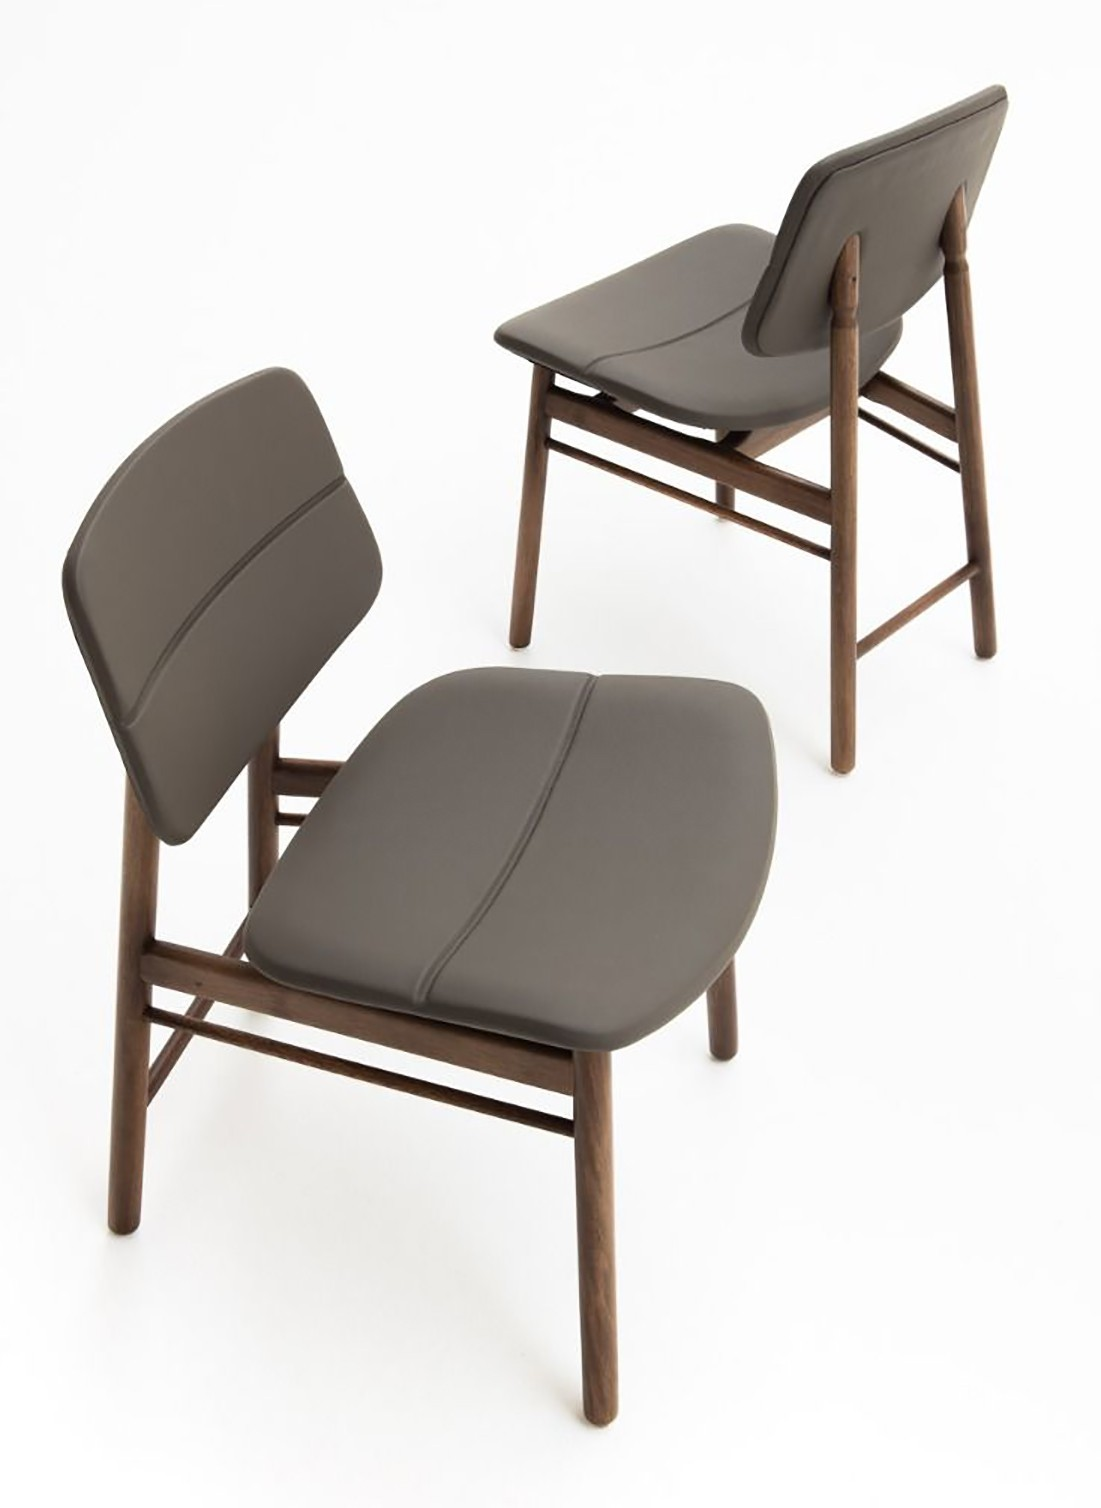 Cadeira Cris • estudiobola